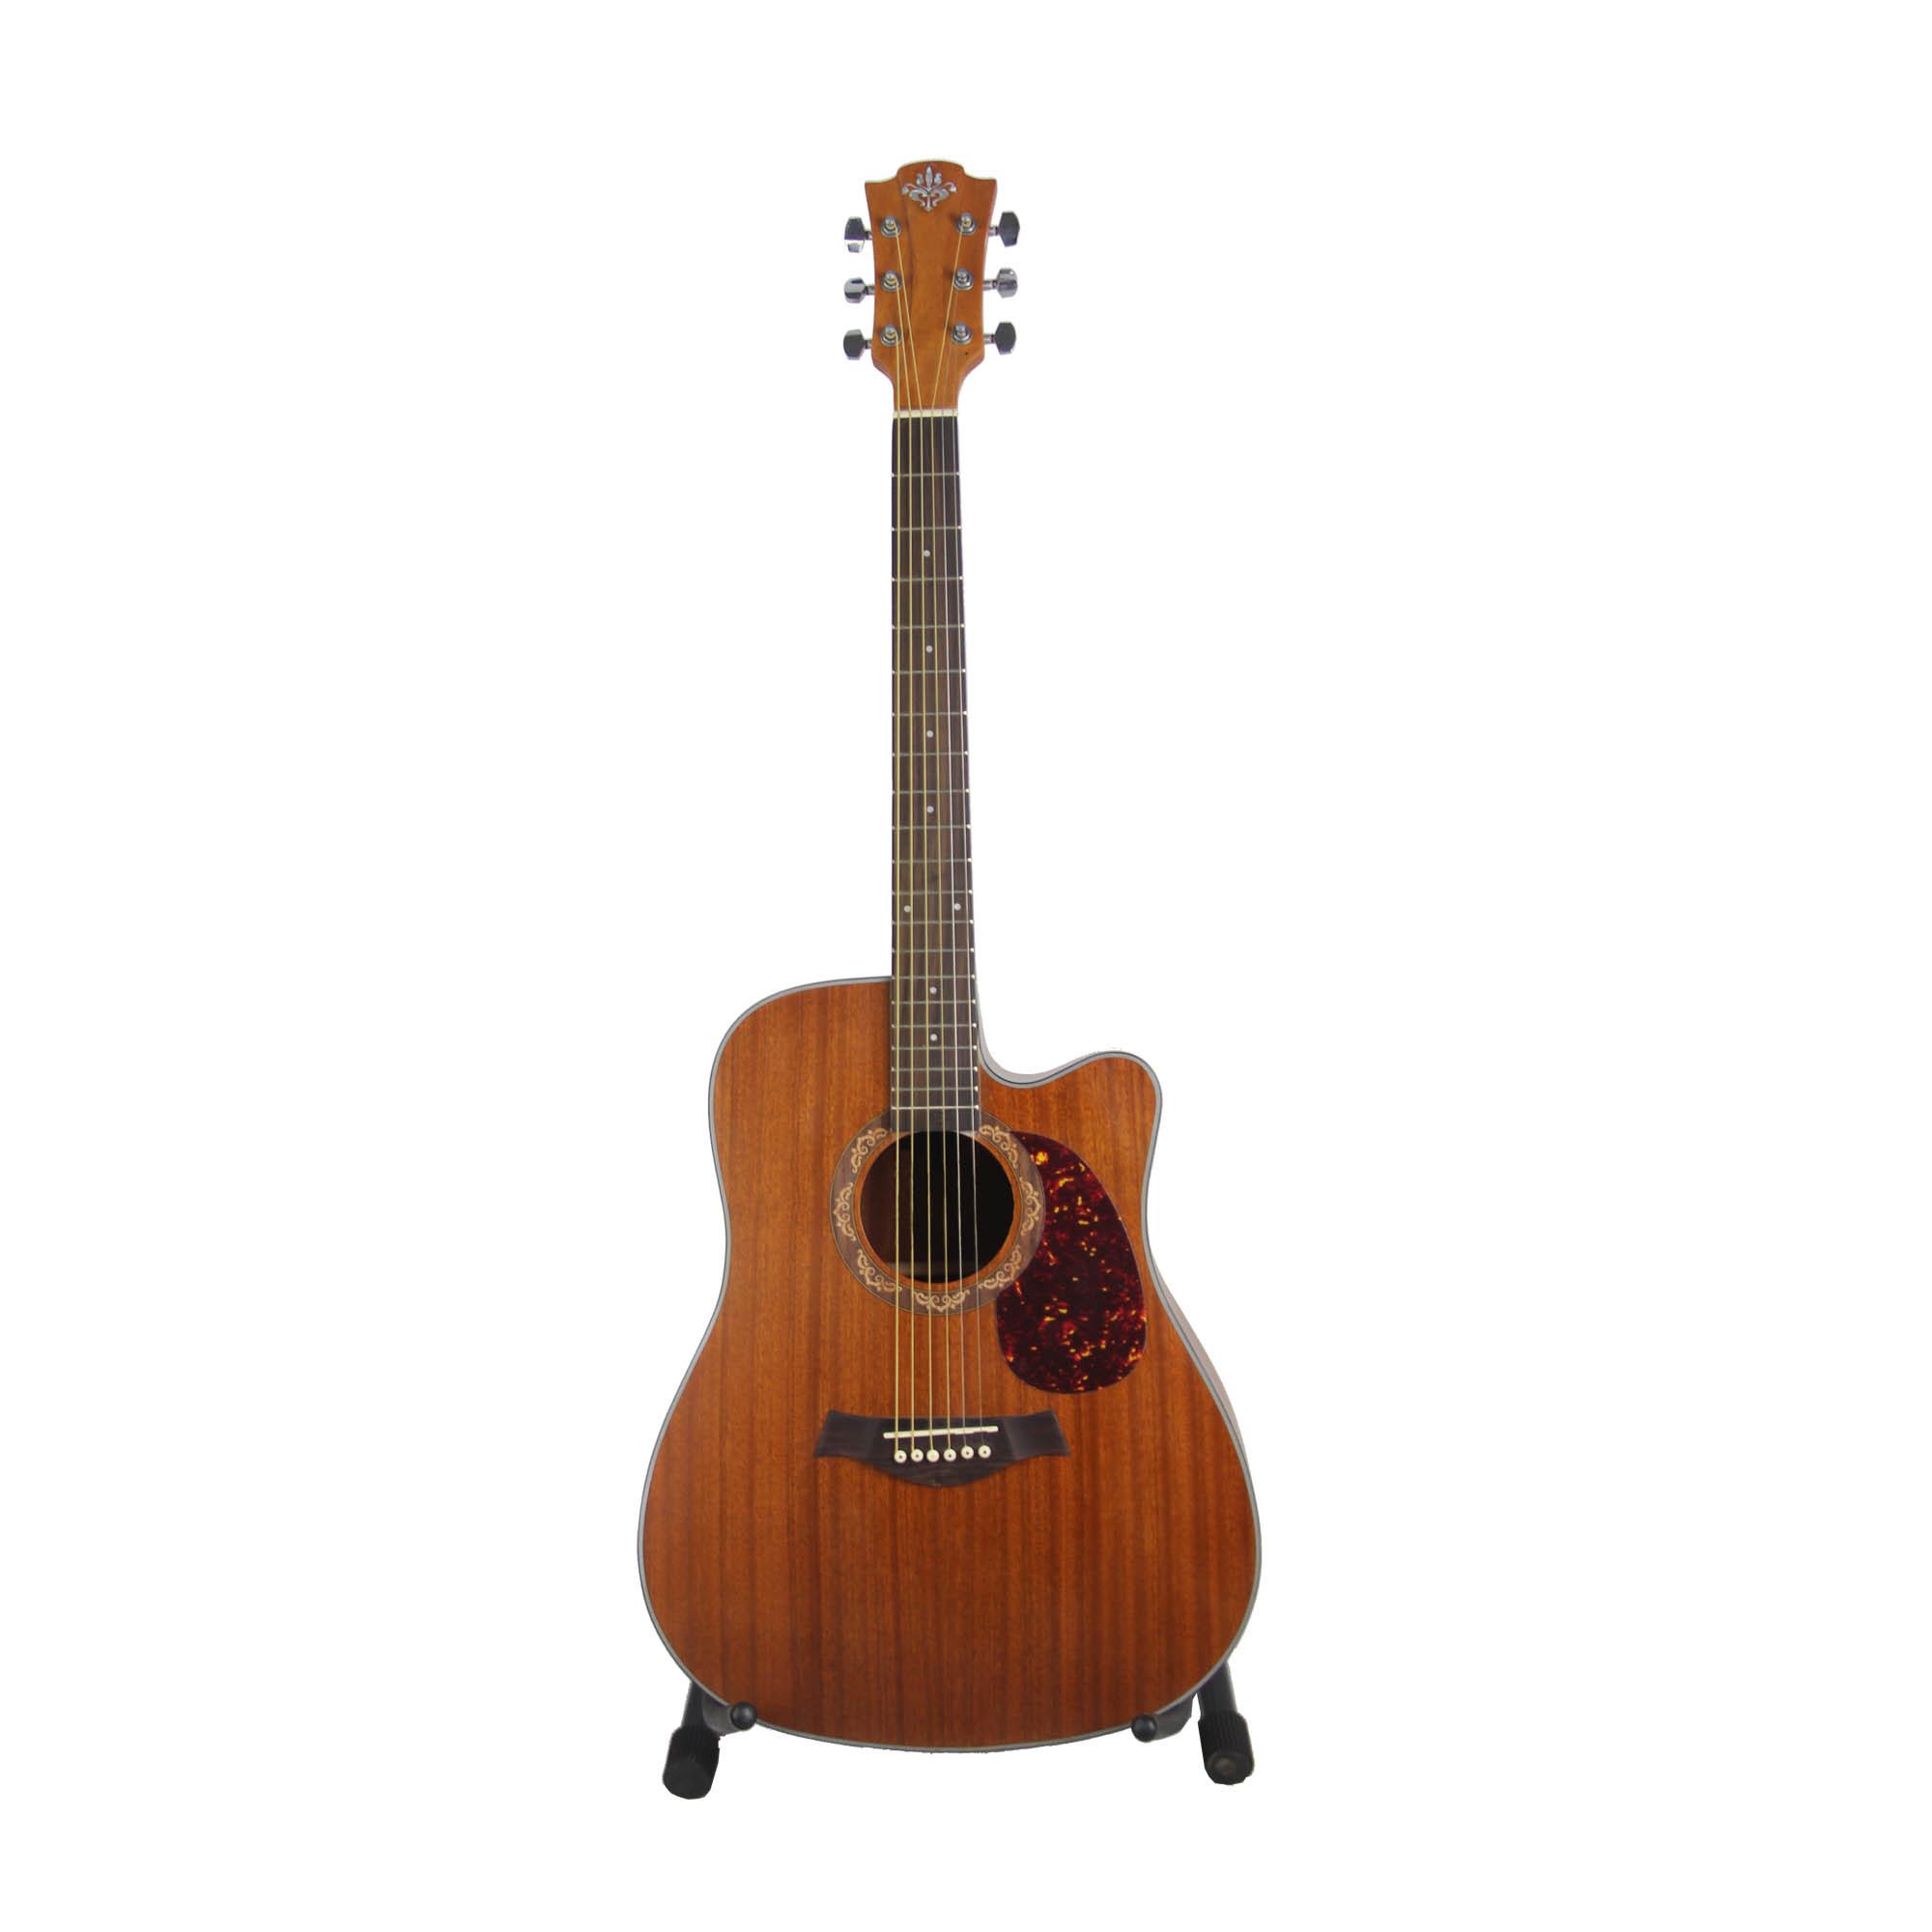 "41"" Spalli Acoustic Guitar Cutaway (AG-4155C)"